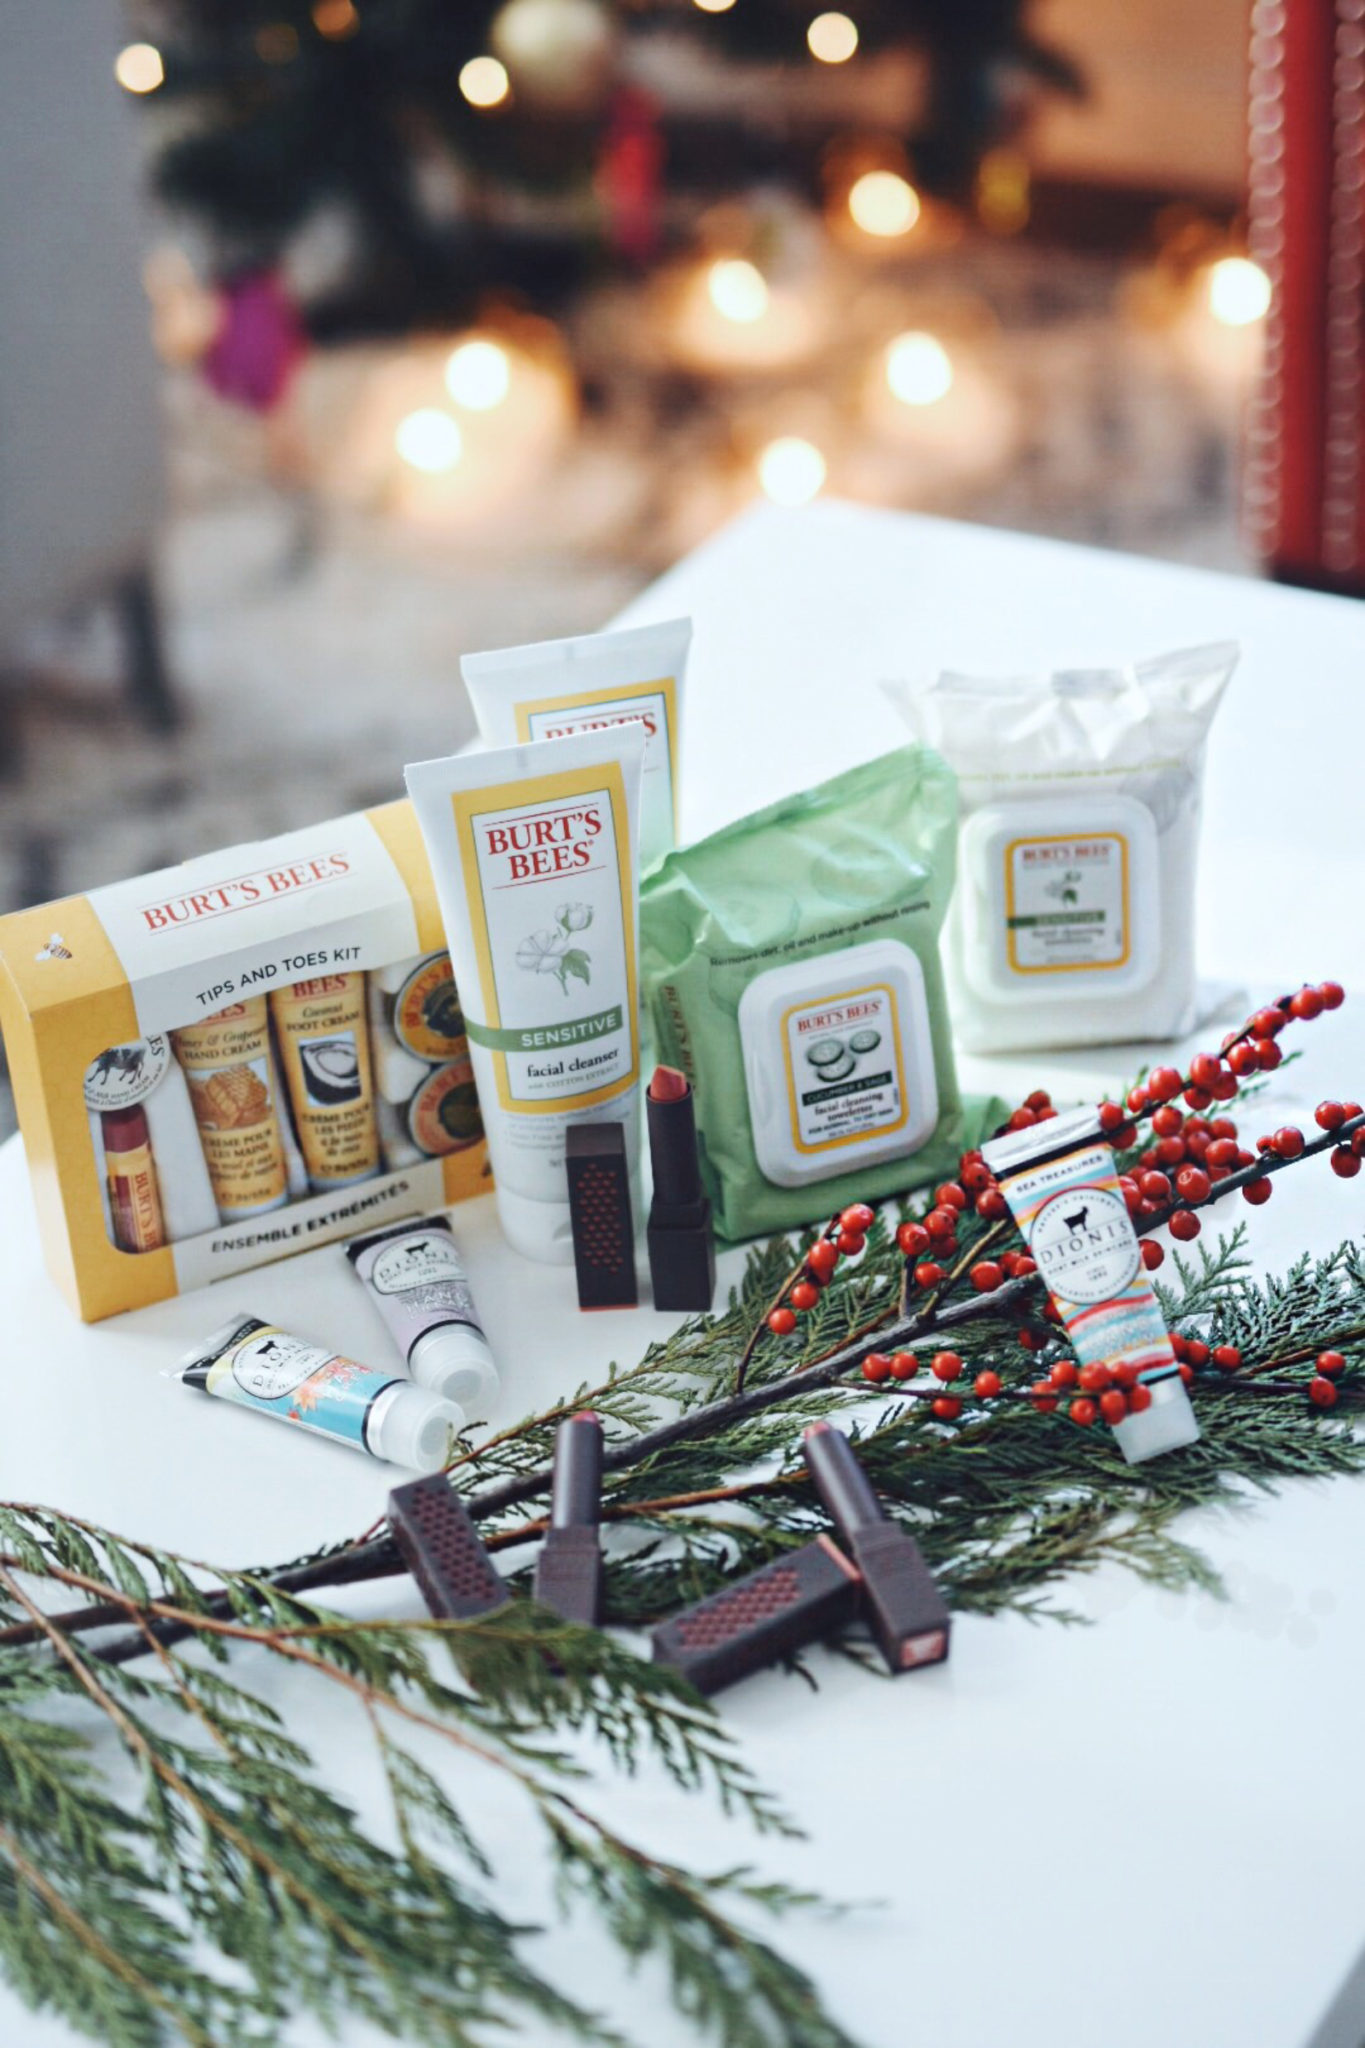 holiday gifts for mom via cracker barrel old country store cracker barrel gifts for her - Cracker Barrel Christmas Eve Hours